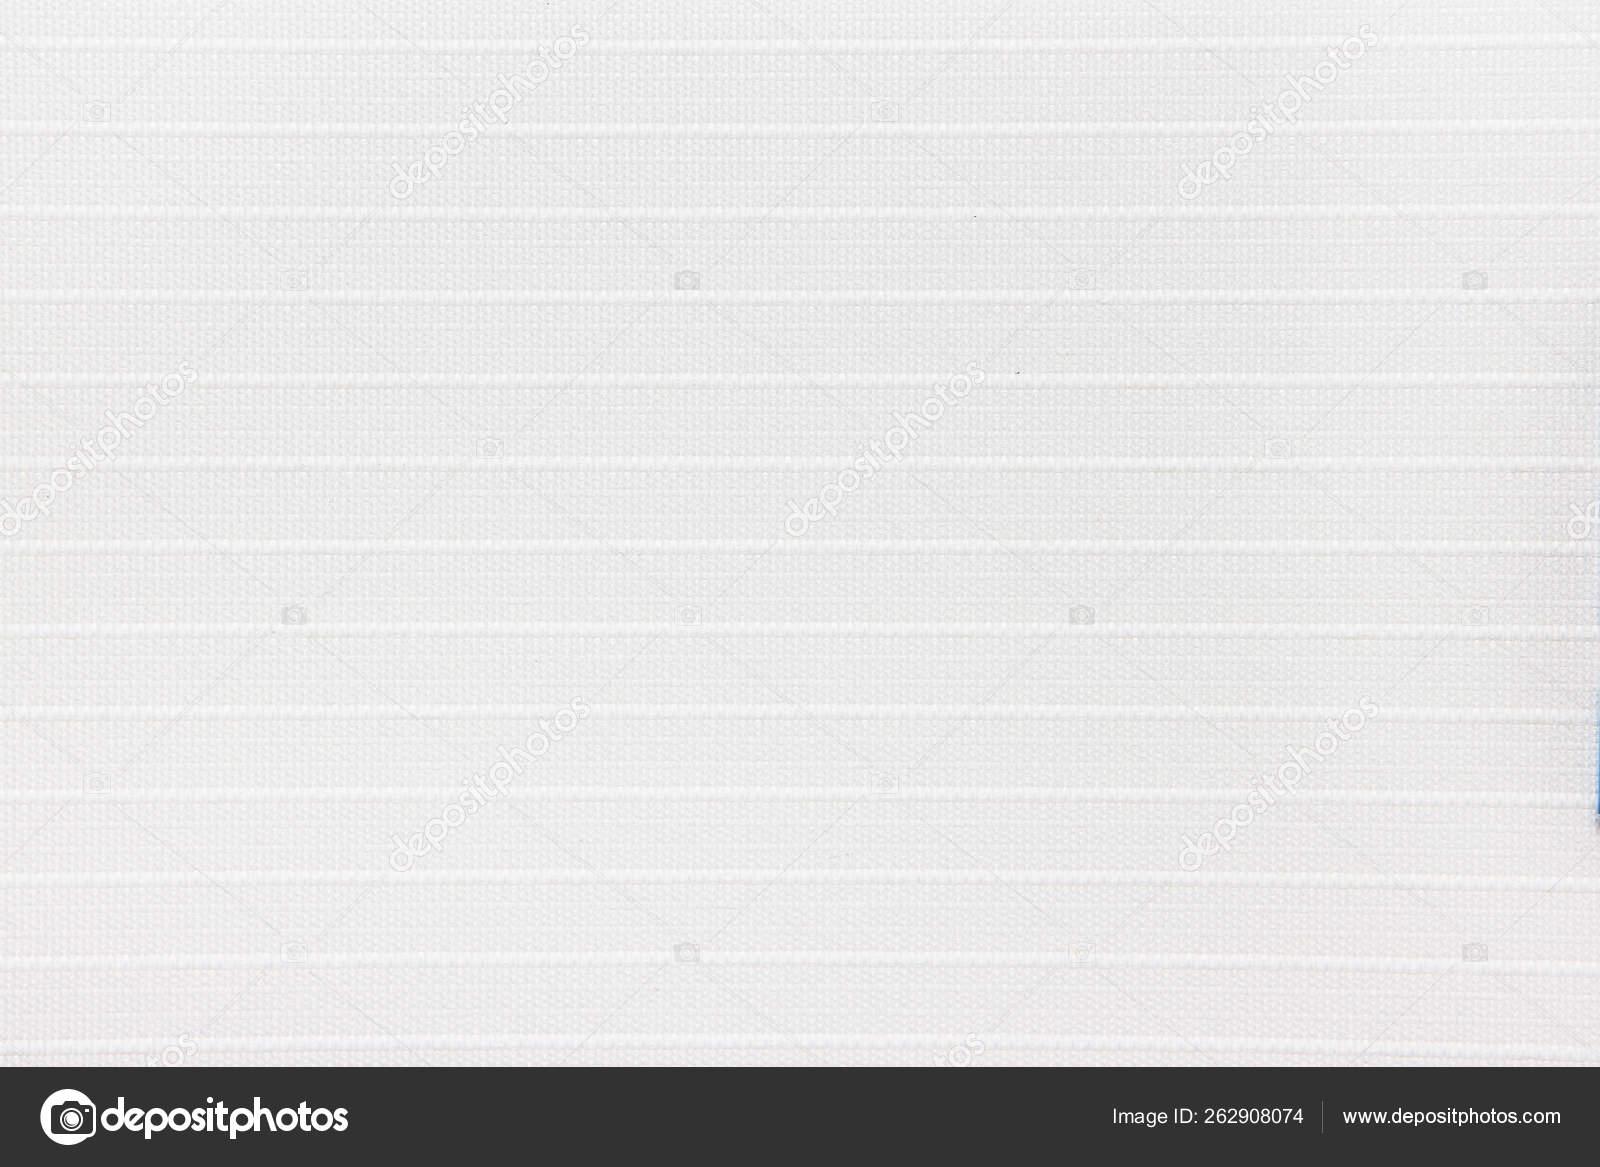 https depositphotos com 262908074 stock photo white fabric blind curtain texture html